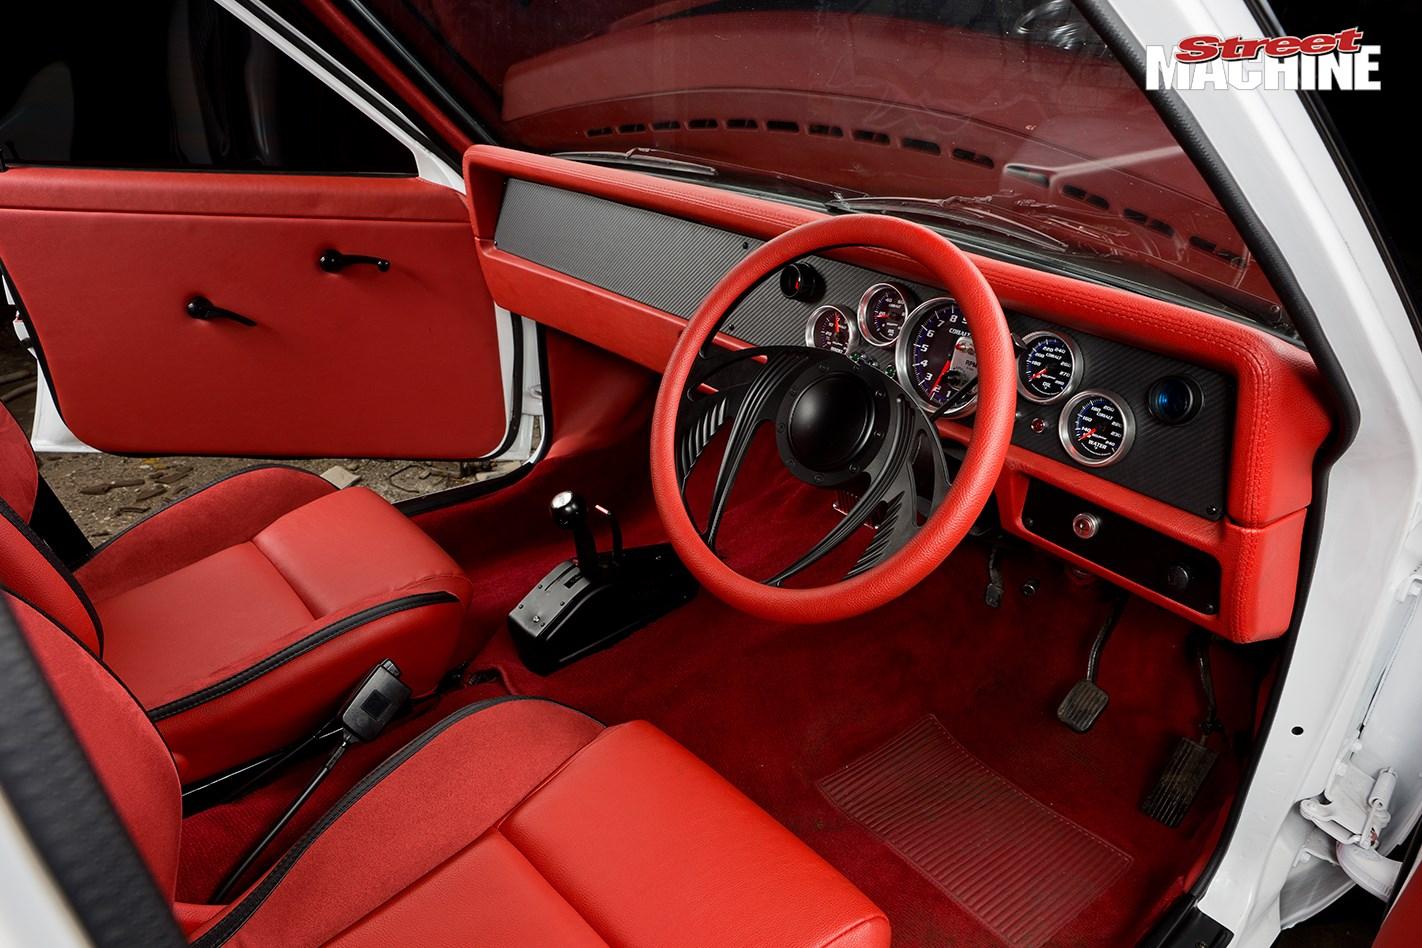 Holden Torana Killa Slr Interior